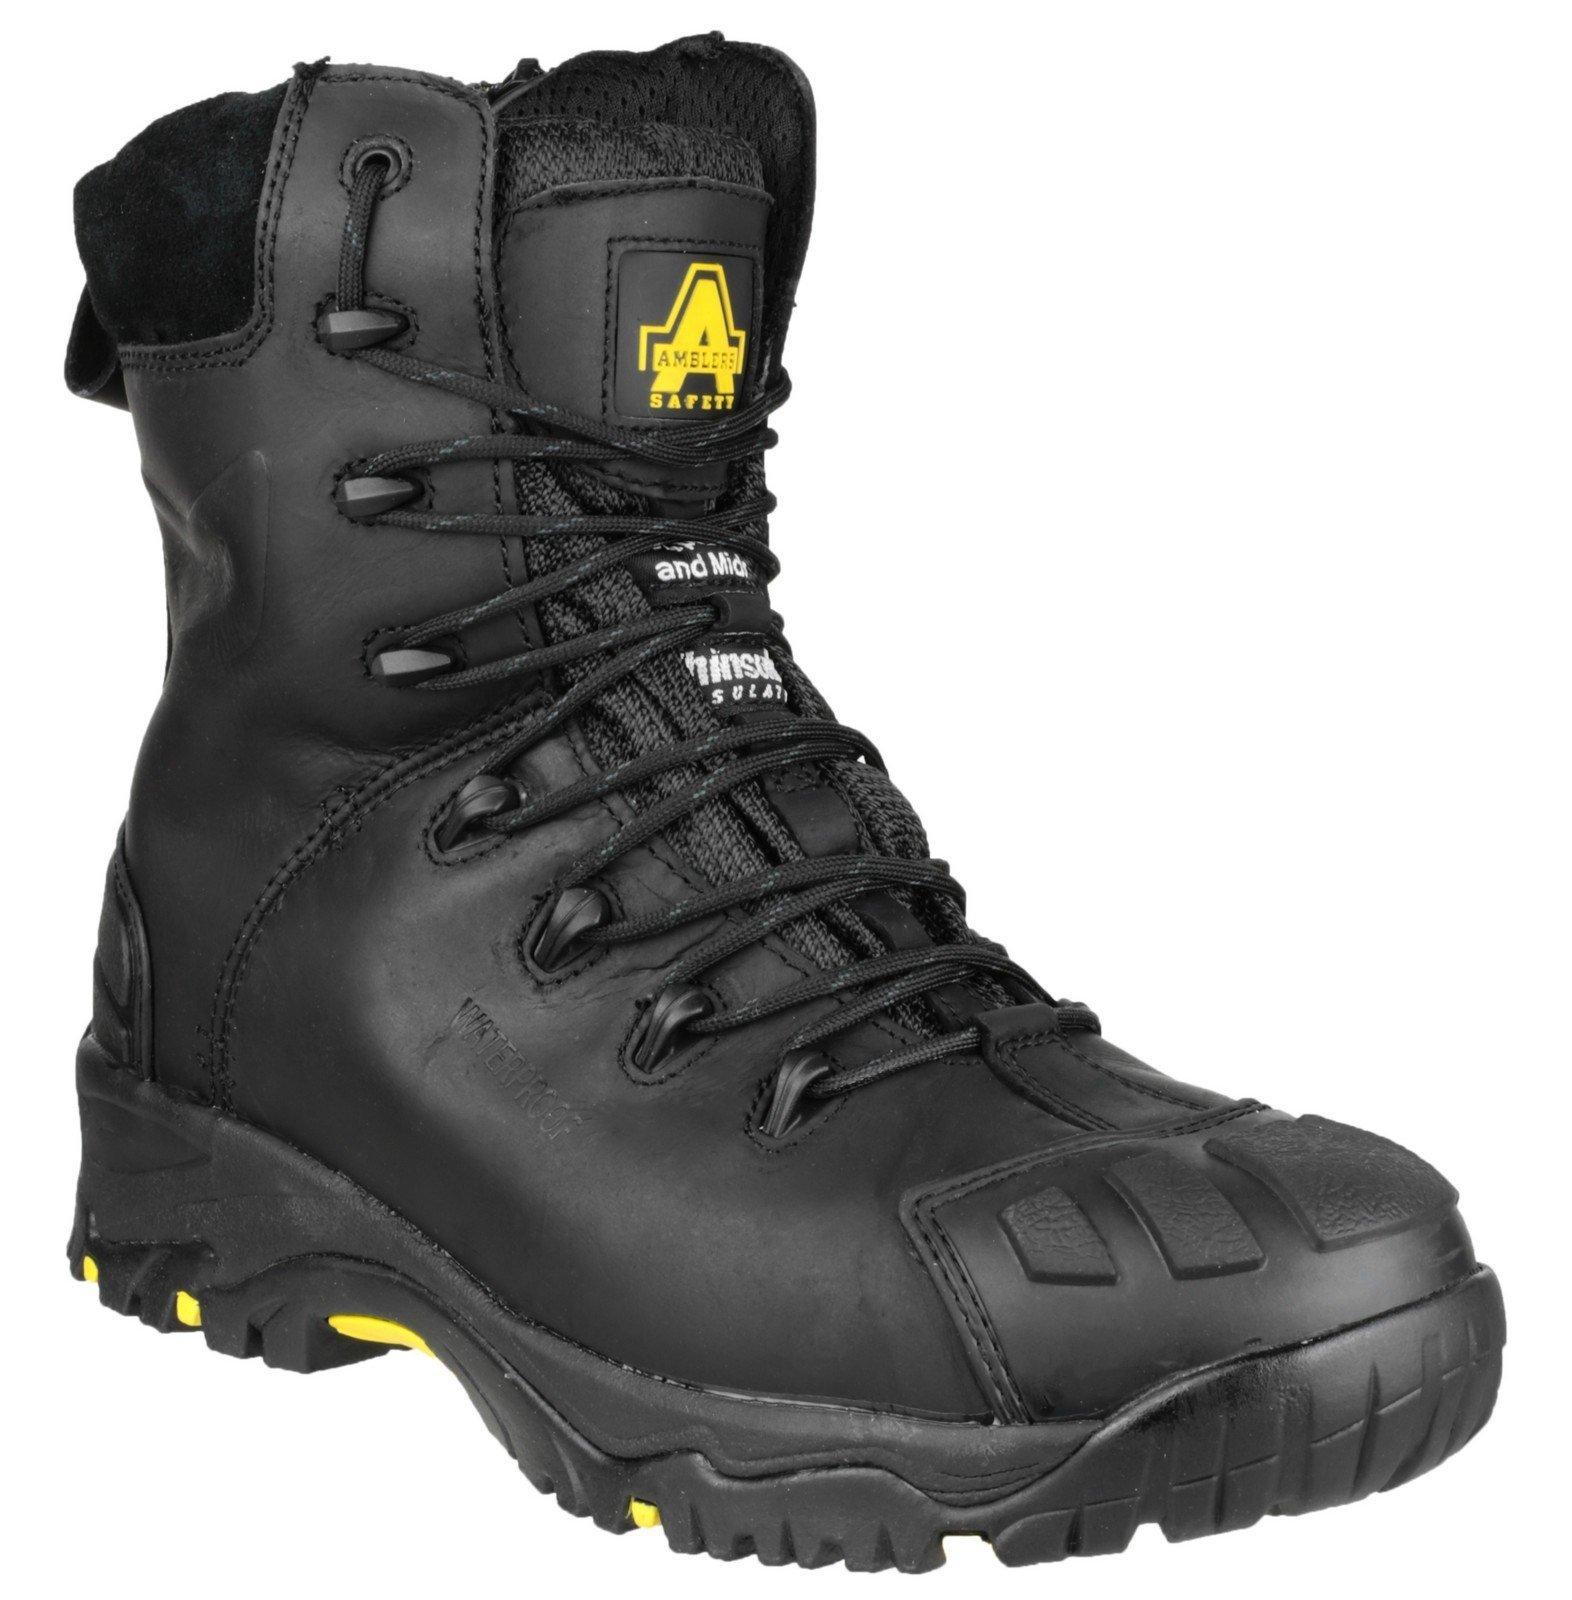 Amblers Unisex Safety Hi Leg Side Zip Boot Black 24868 - Black 4